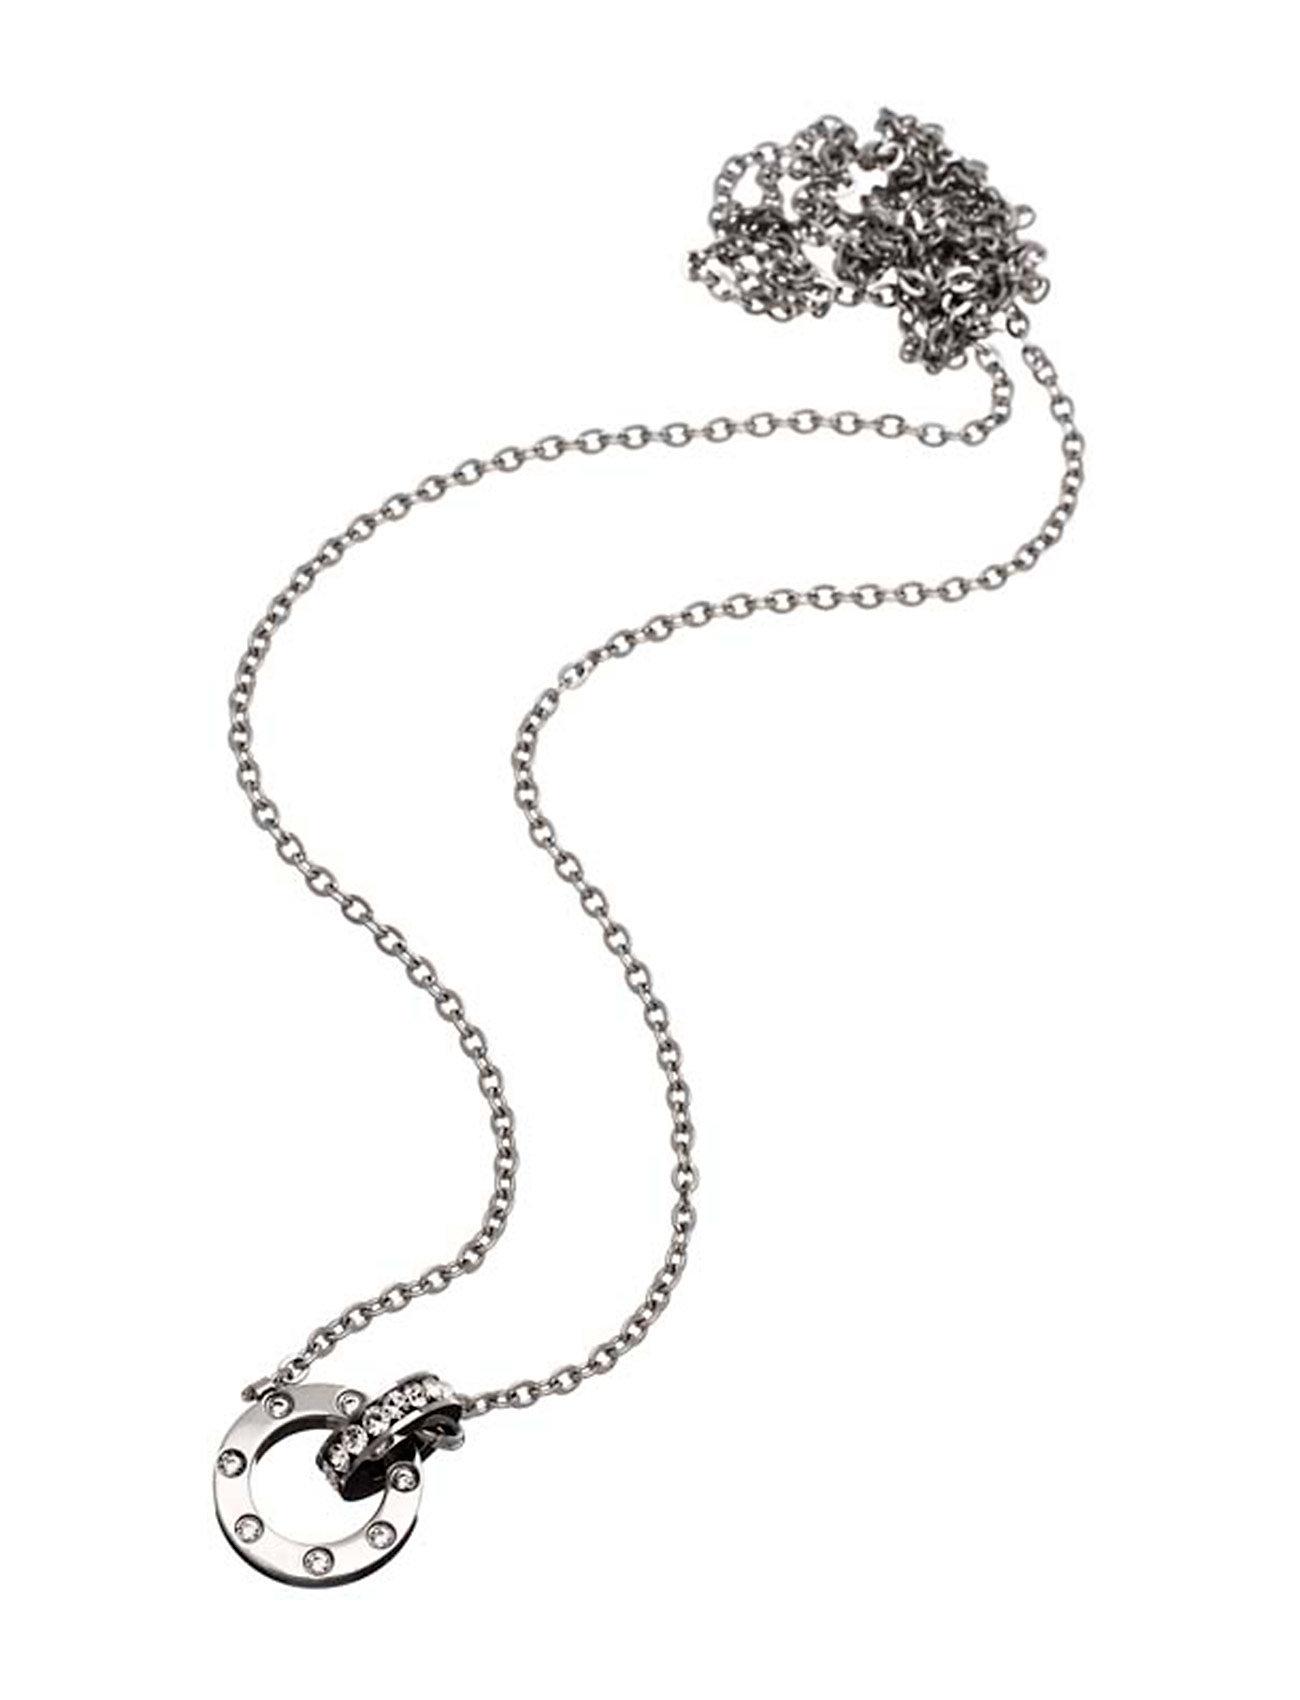 Ida necklace mini fra edblad fra boozt.com dk